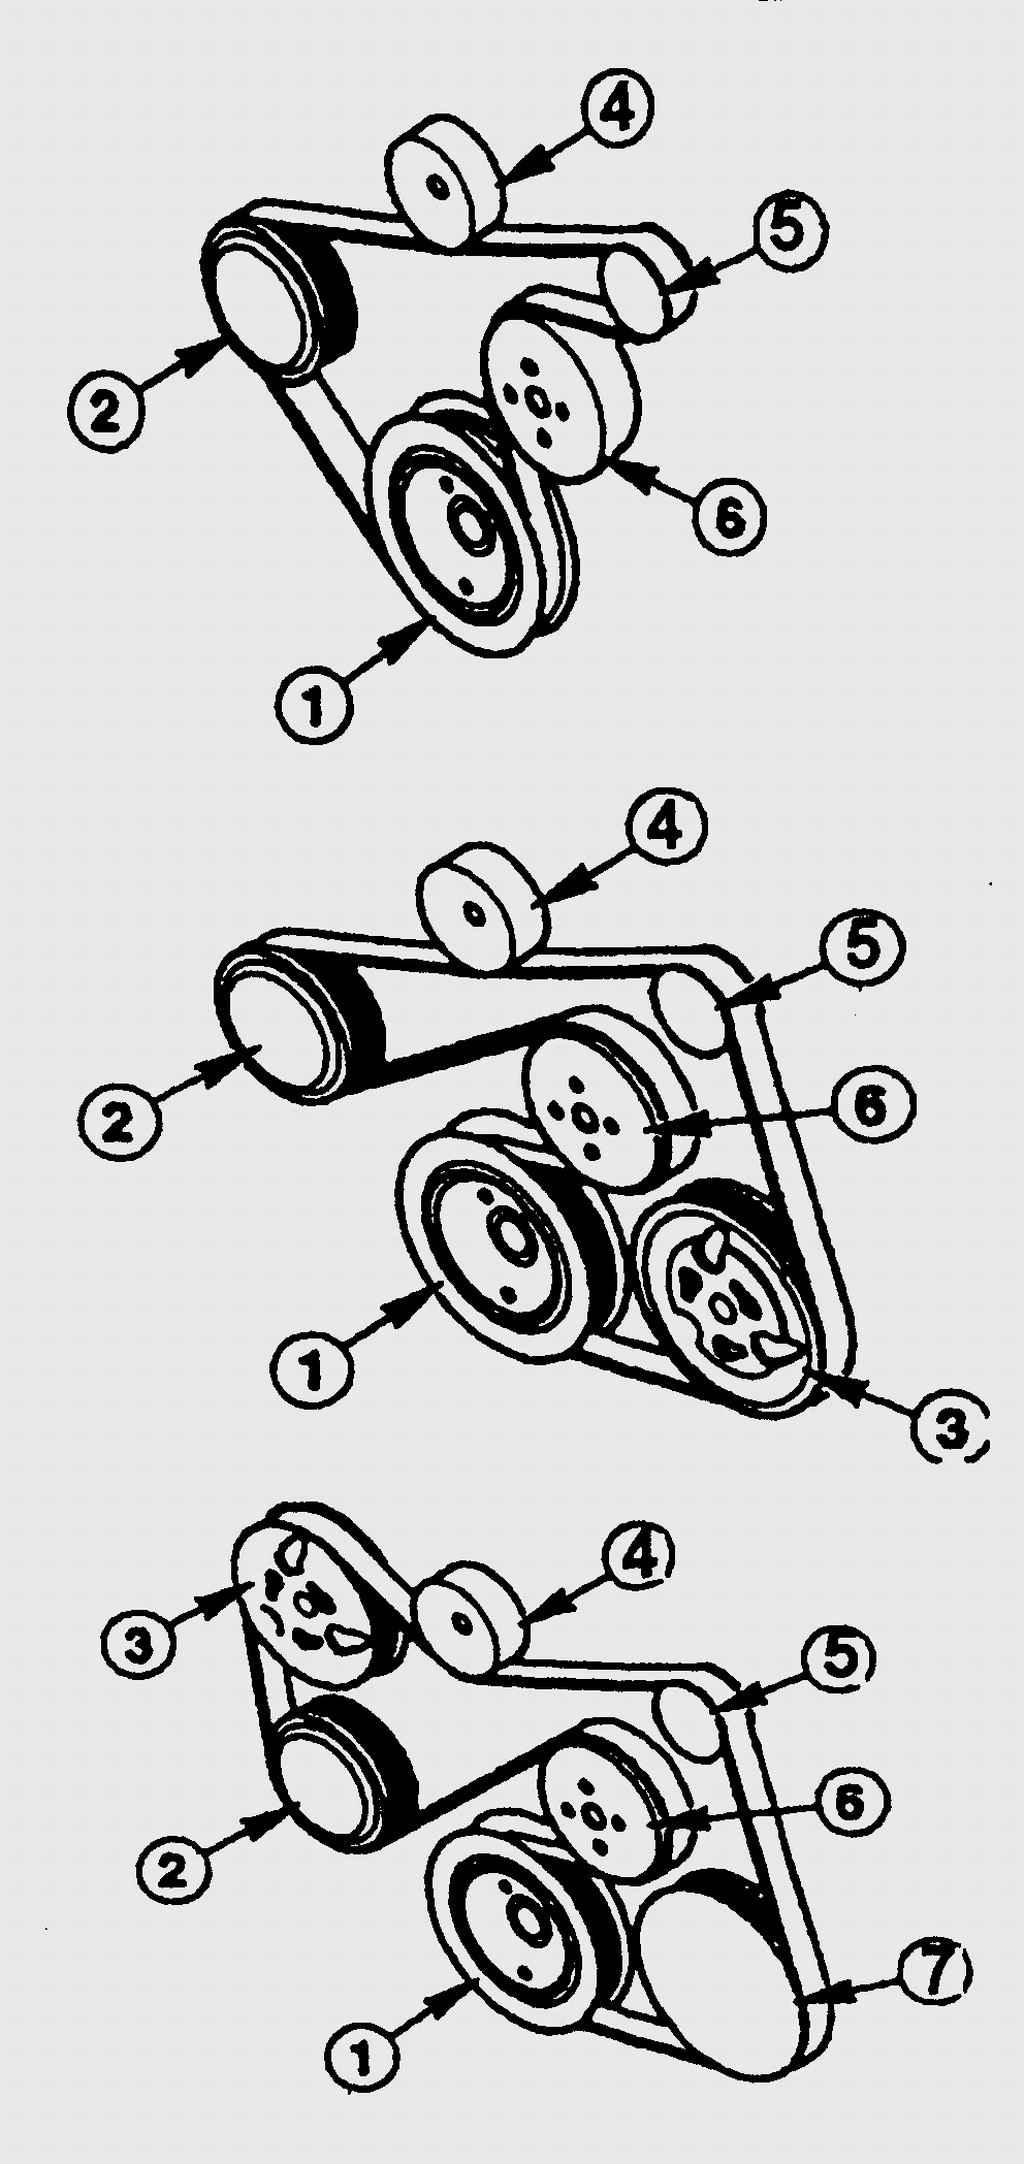 Замена ремня грм форд фокус 8